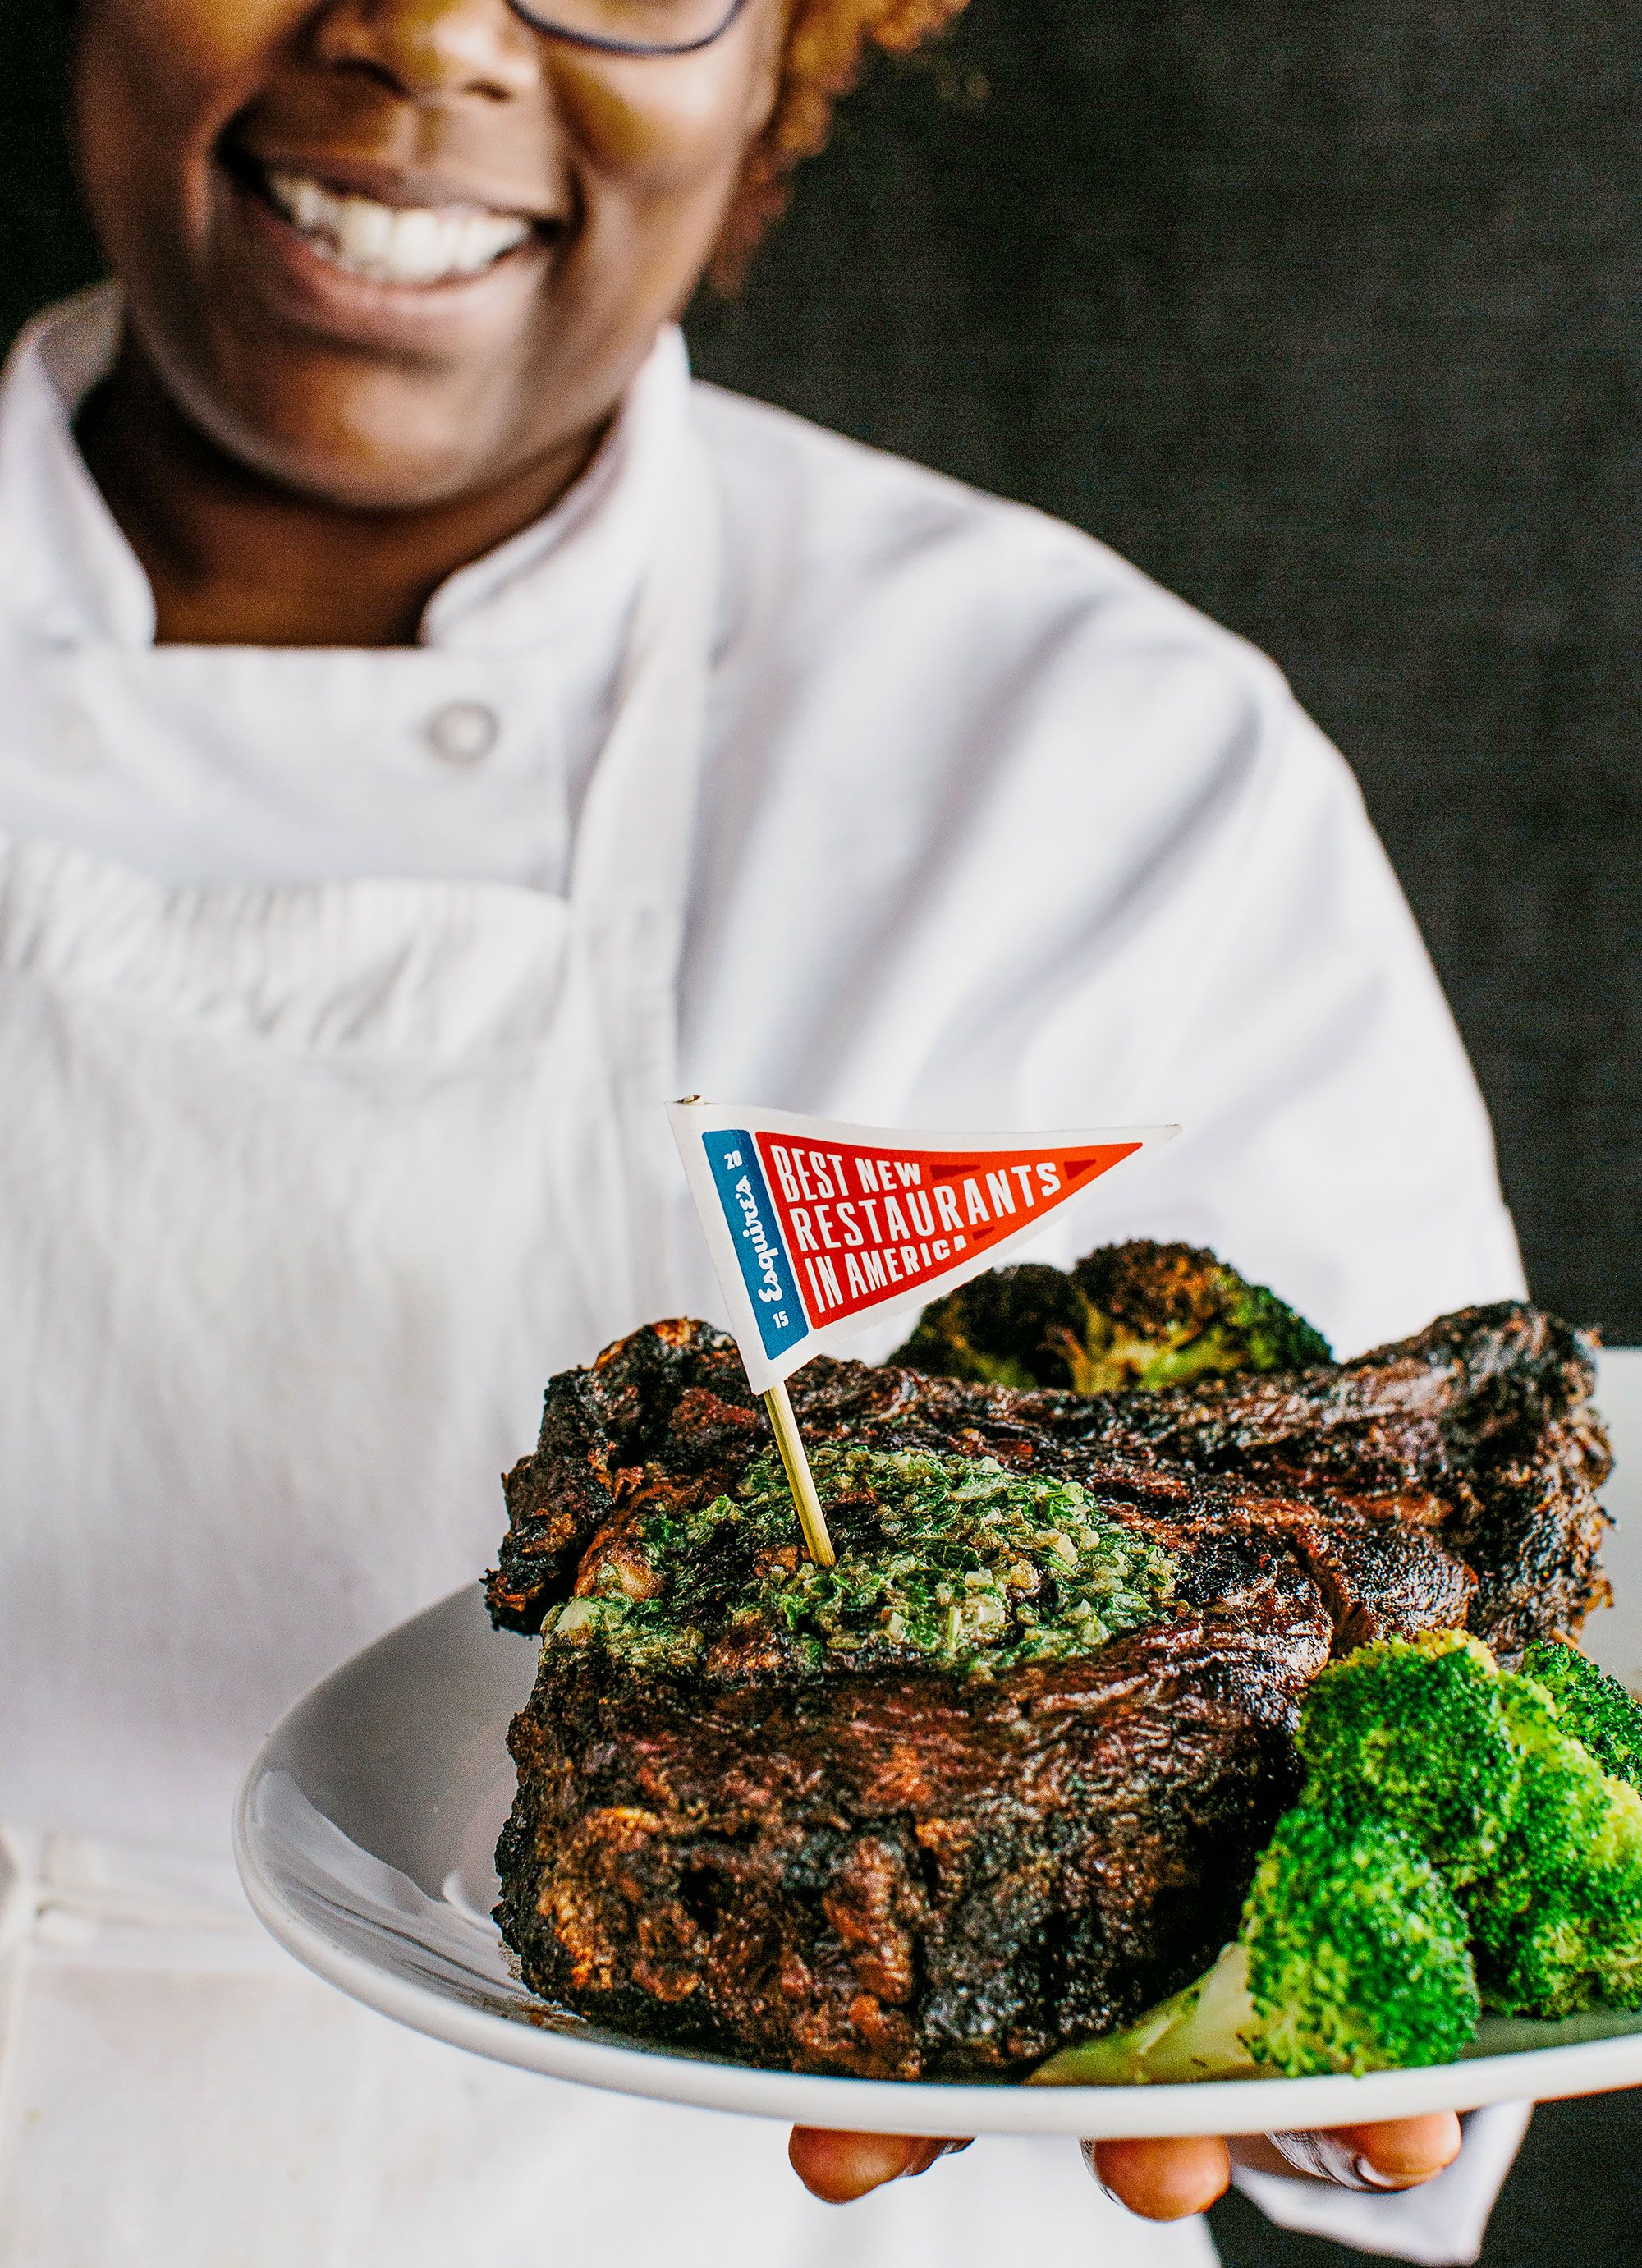 Best New Restaurants 2015 - Best New Restaurants in America List